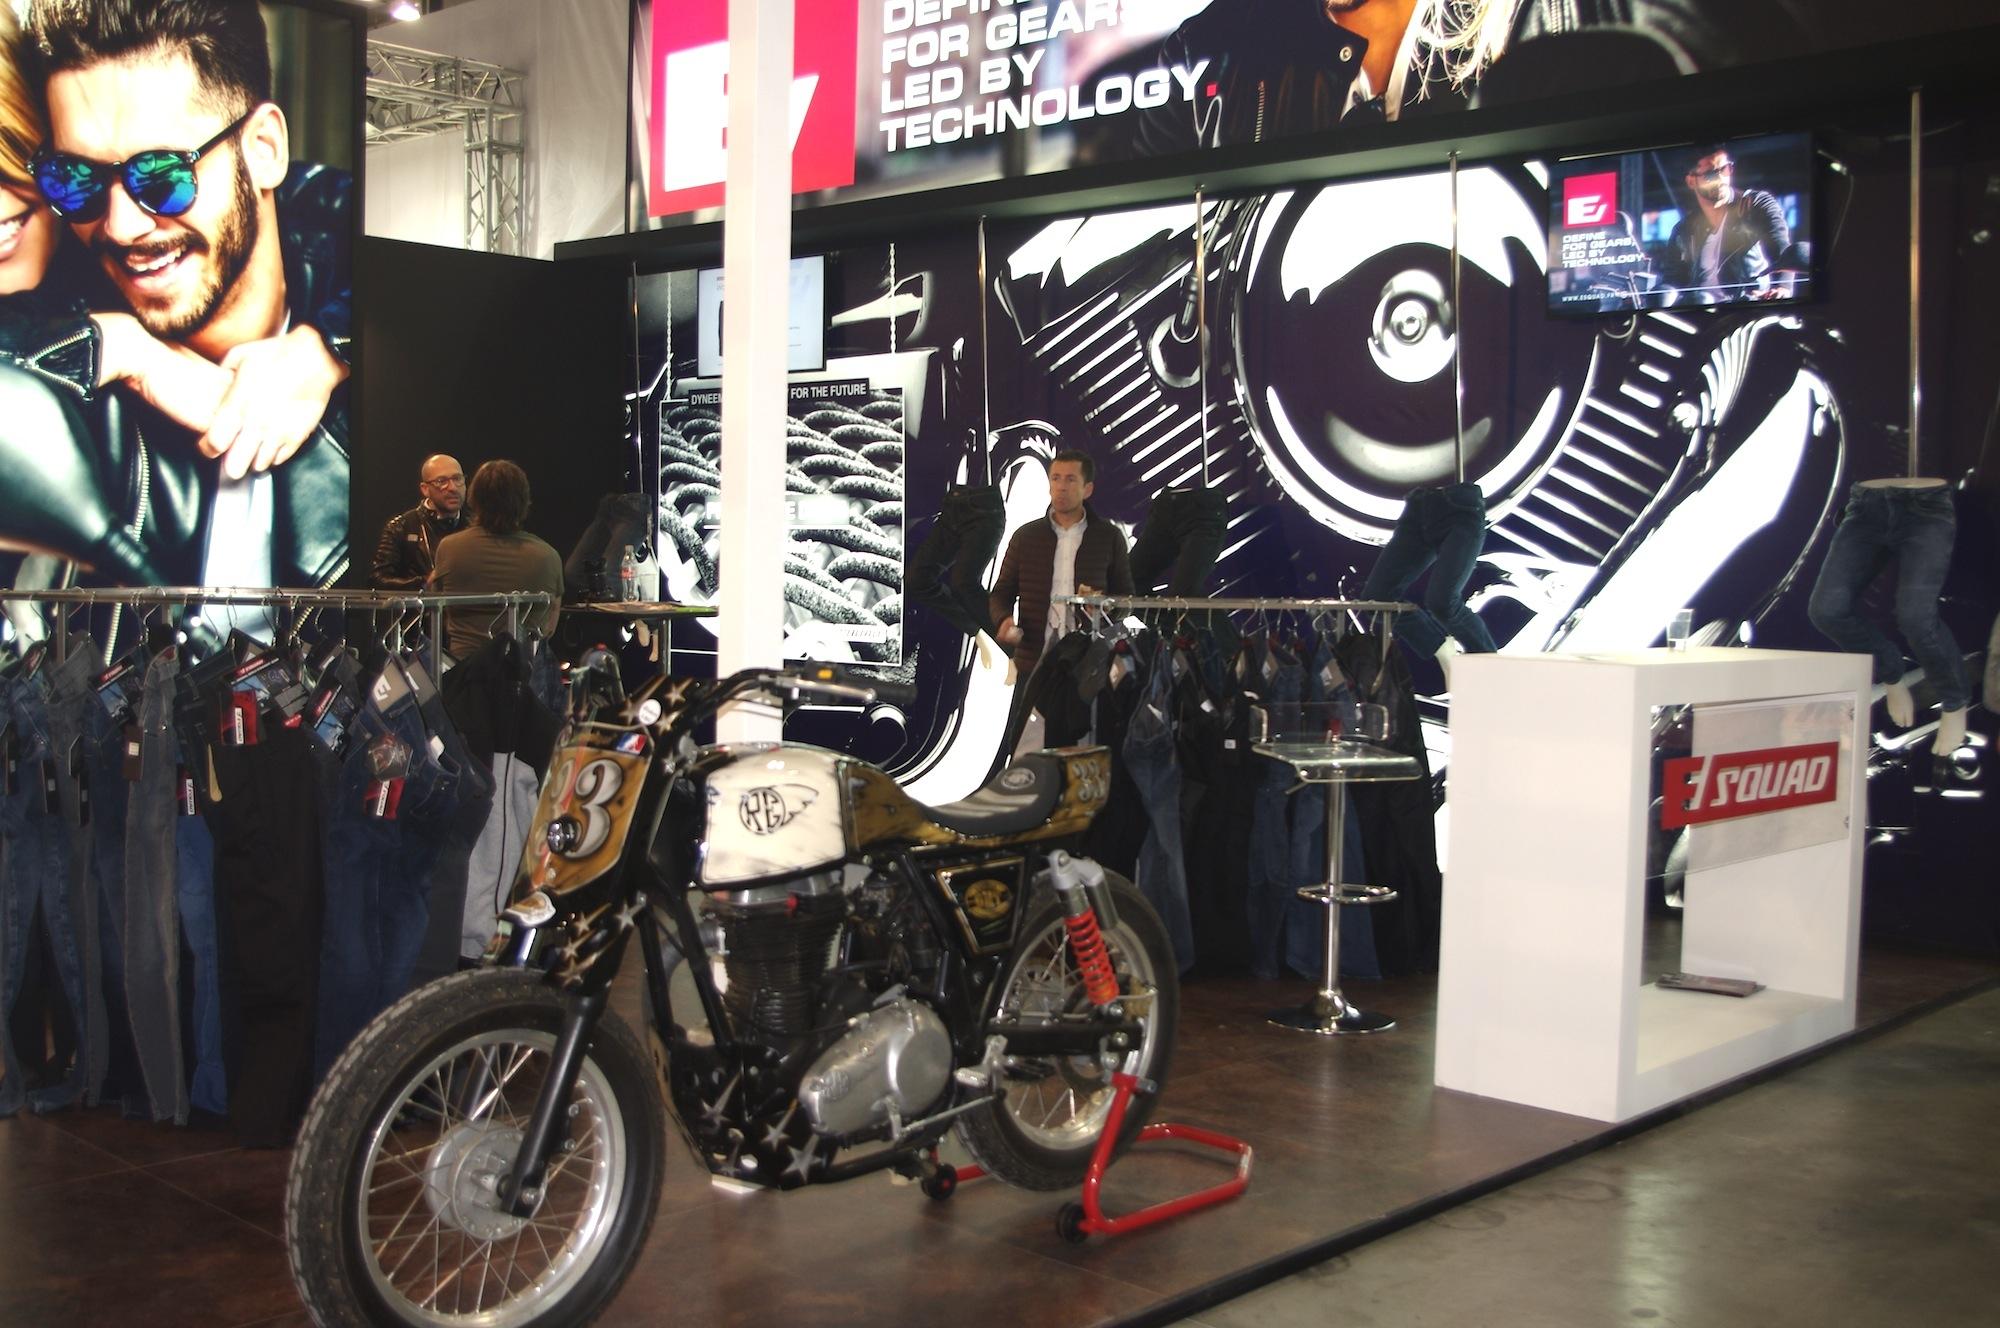 Salon de milan 2017 en direct esquad for Salon moto milan 2017